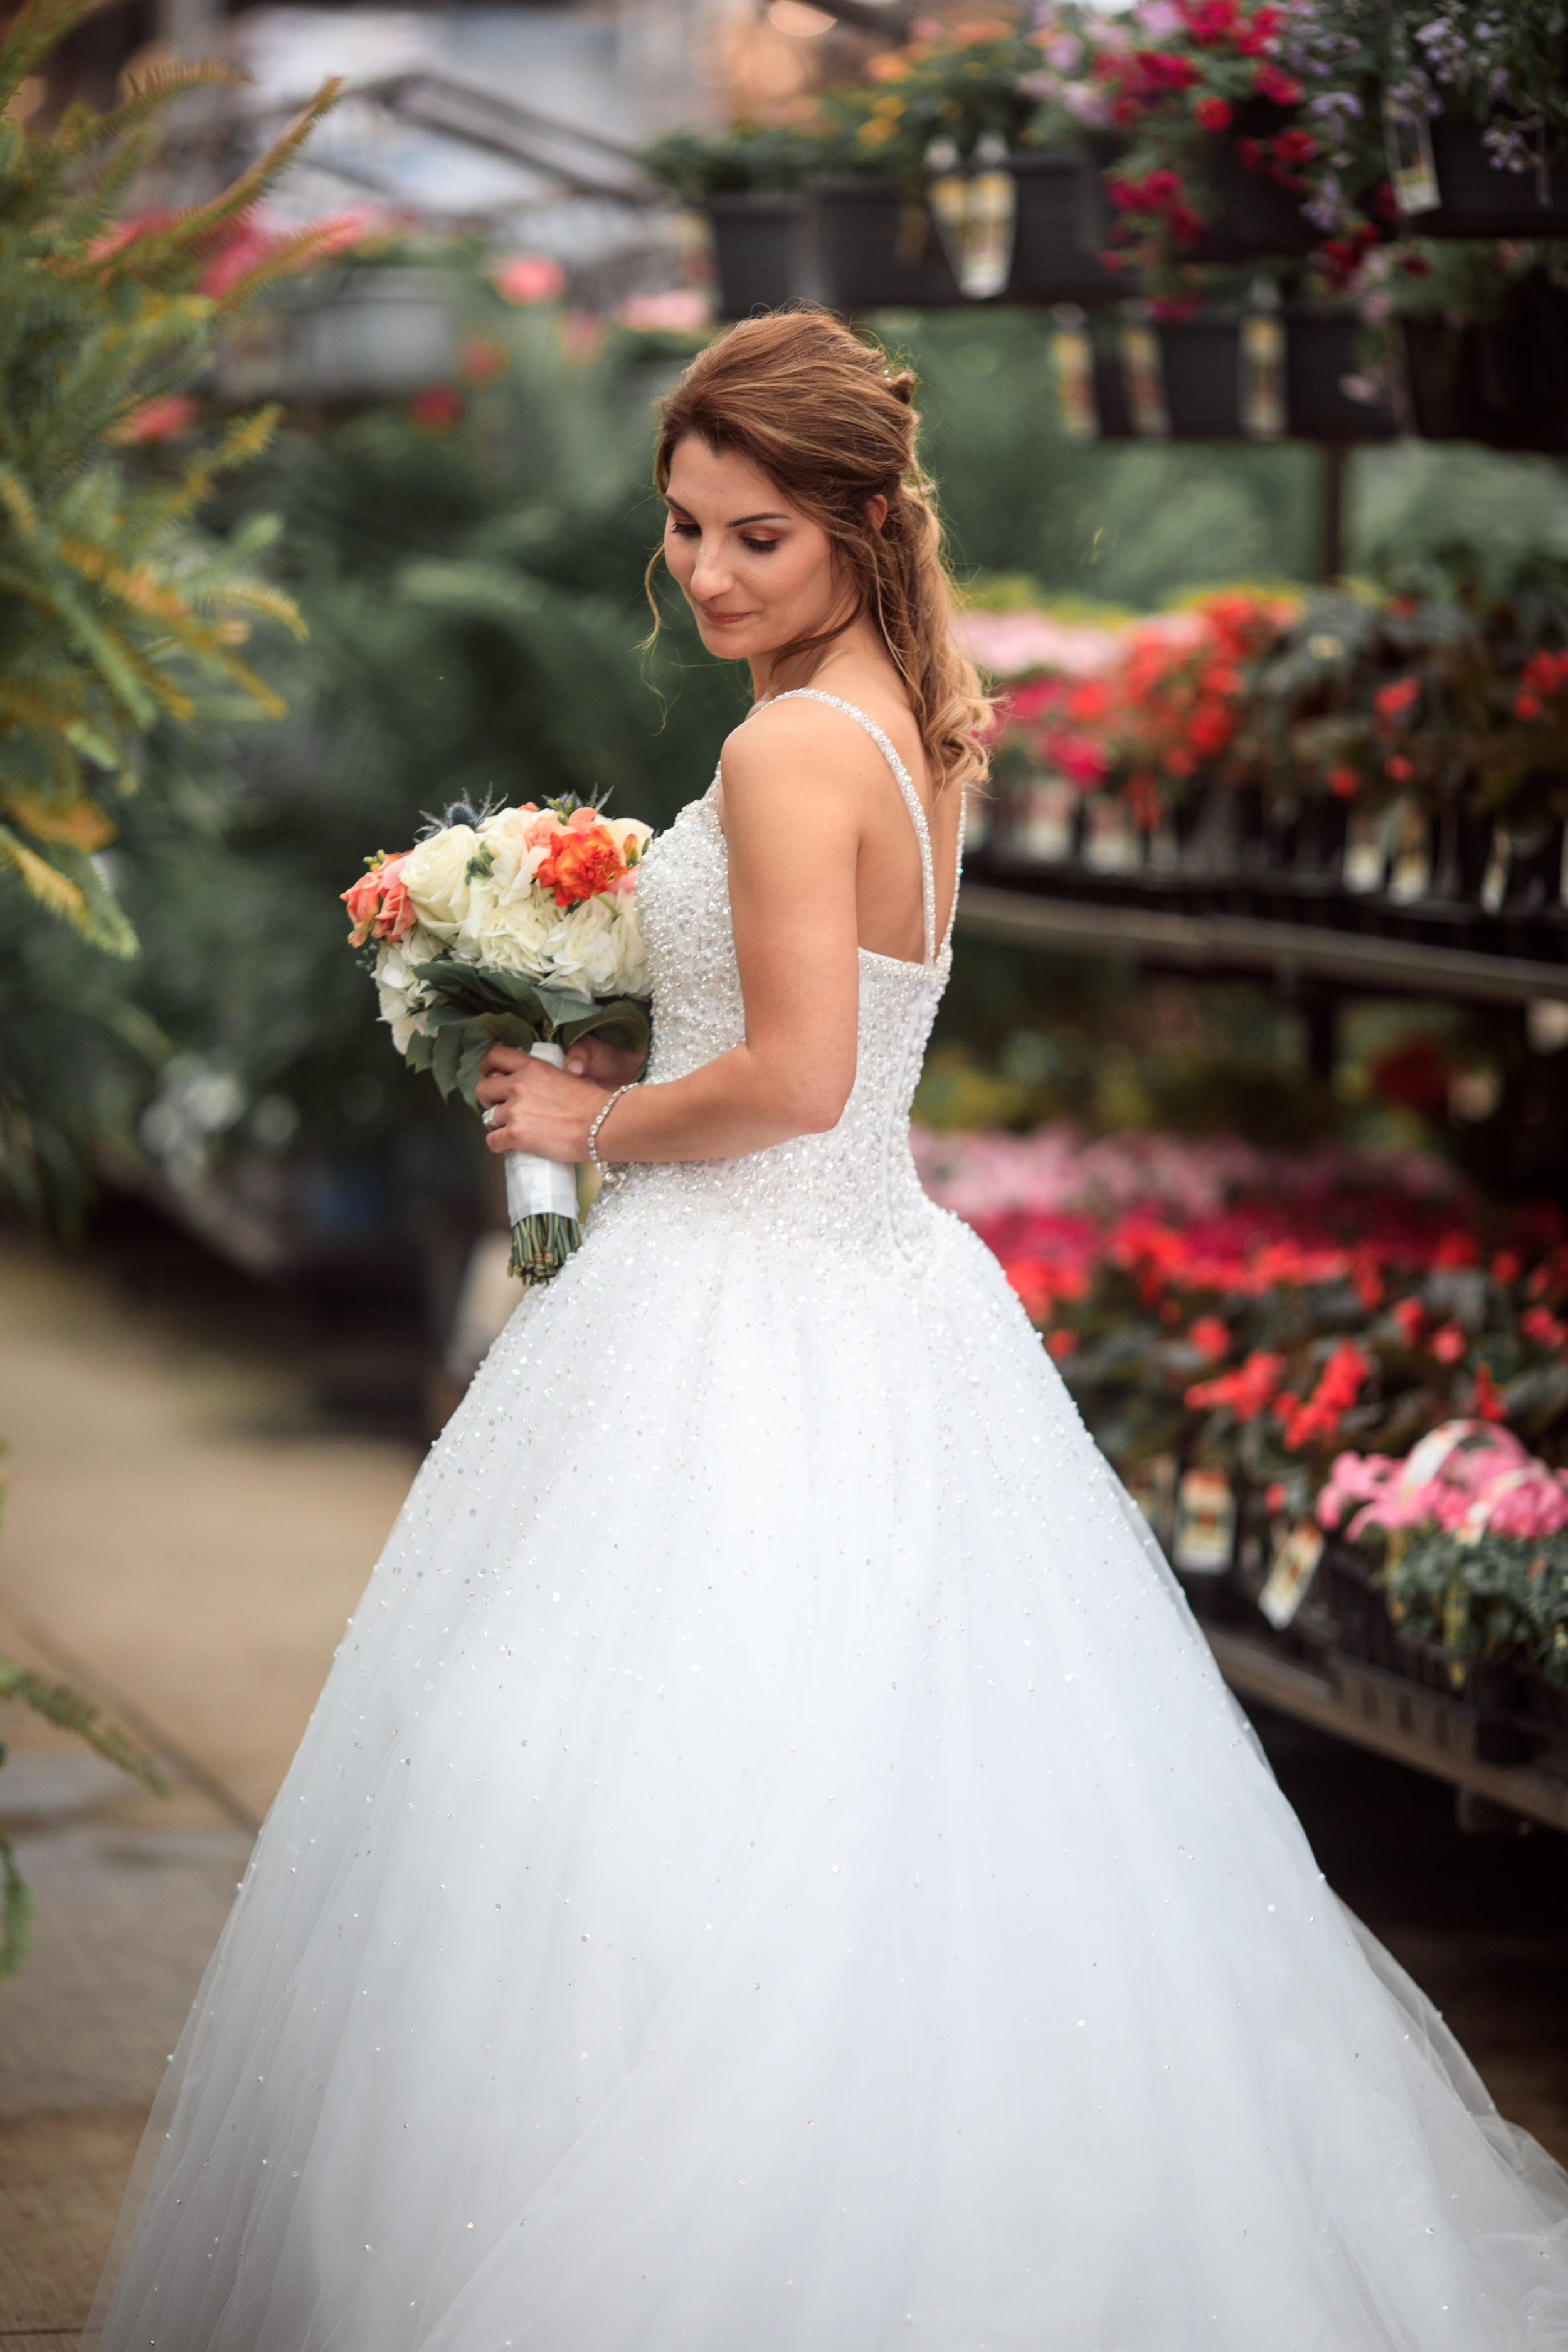 Wedding-couple-takes-photos-at-lowes-hardware-due-to-rain23.jpg